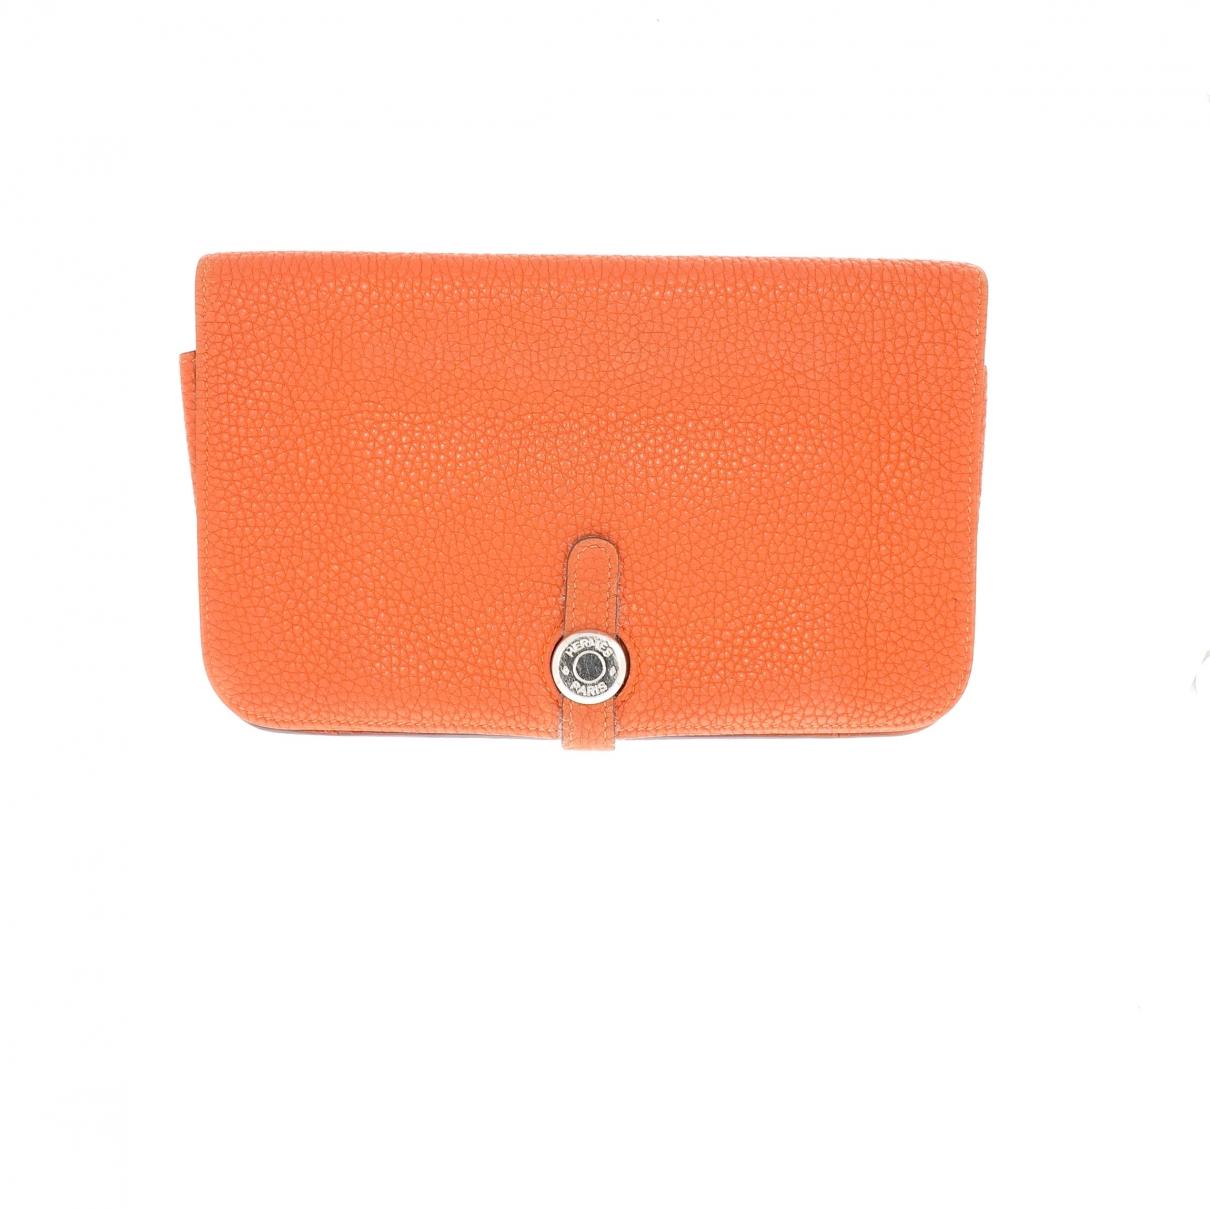 Hermes - Portefeuille Dogon pour femme en cuir - orange